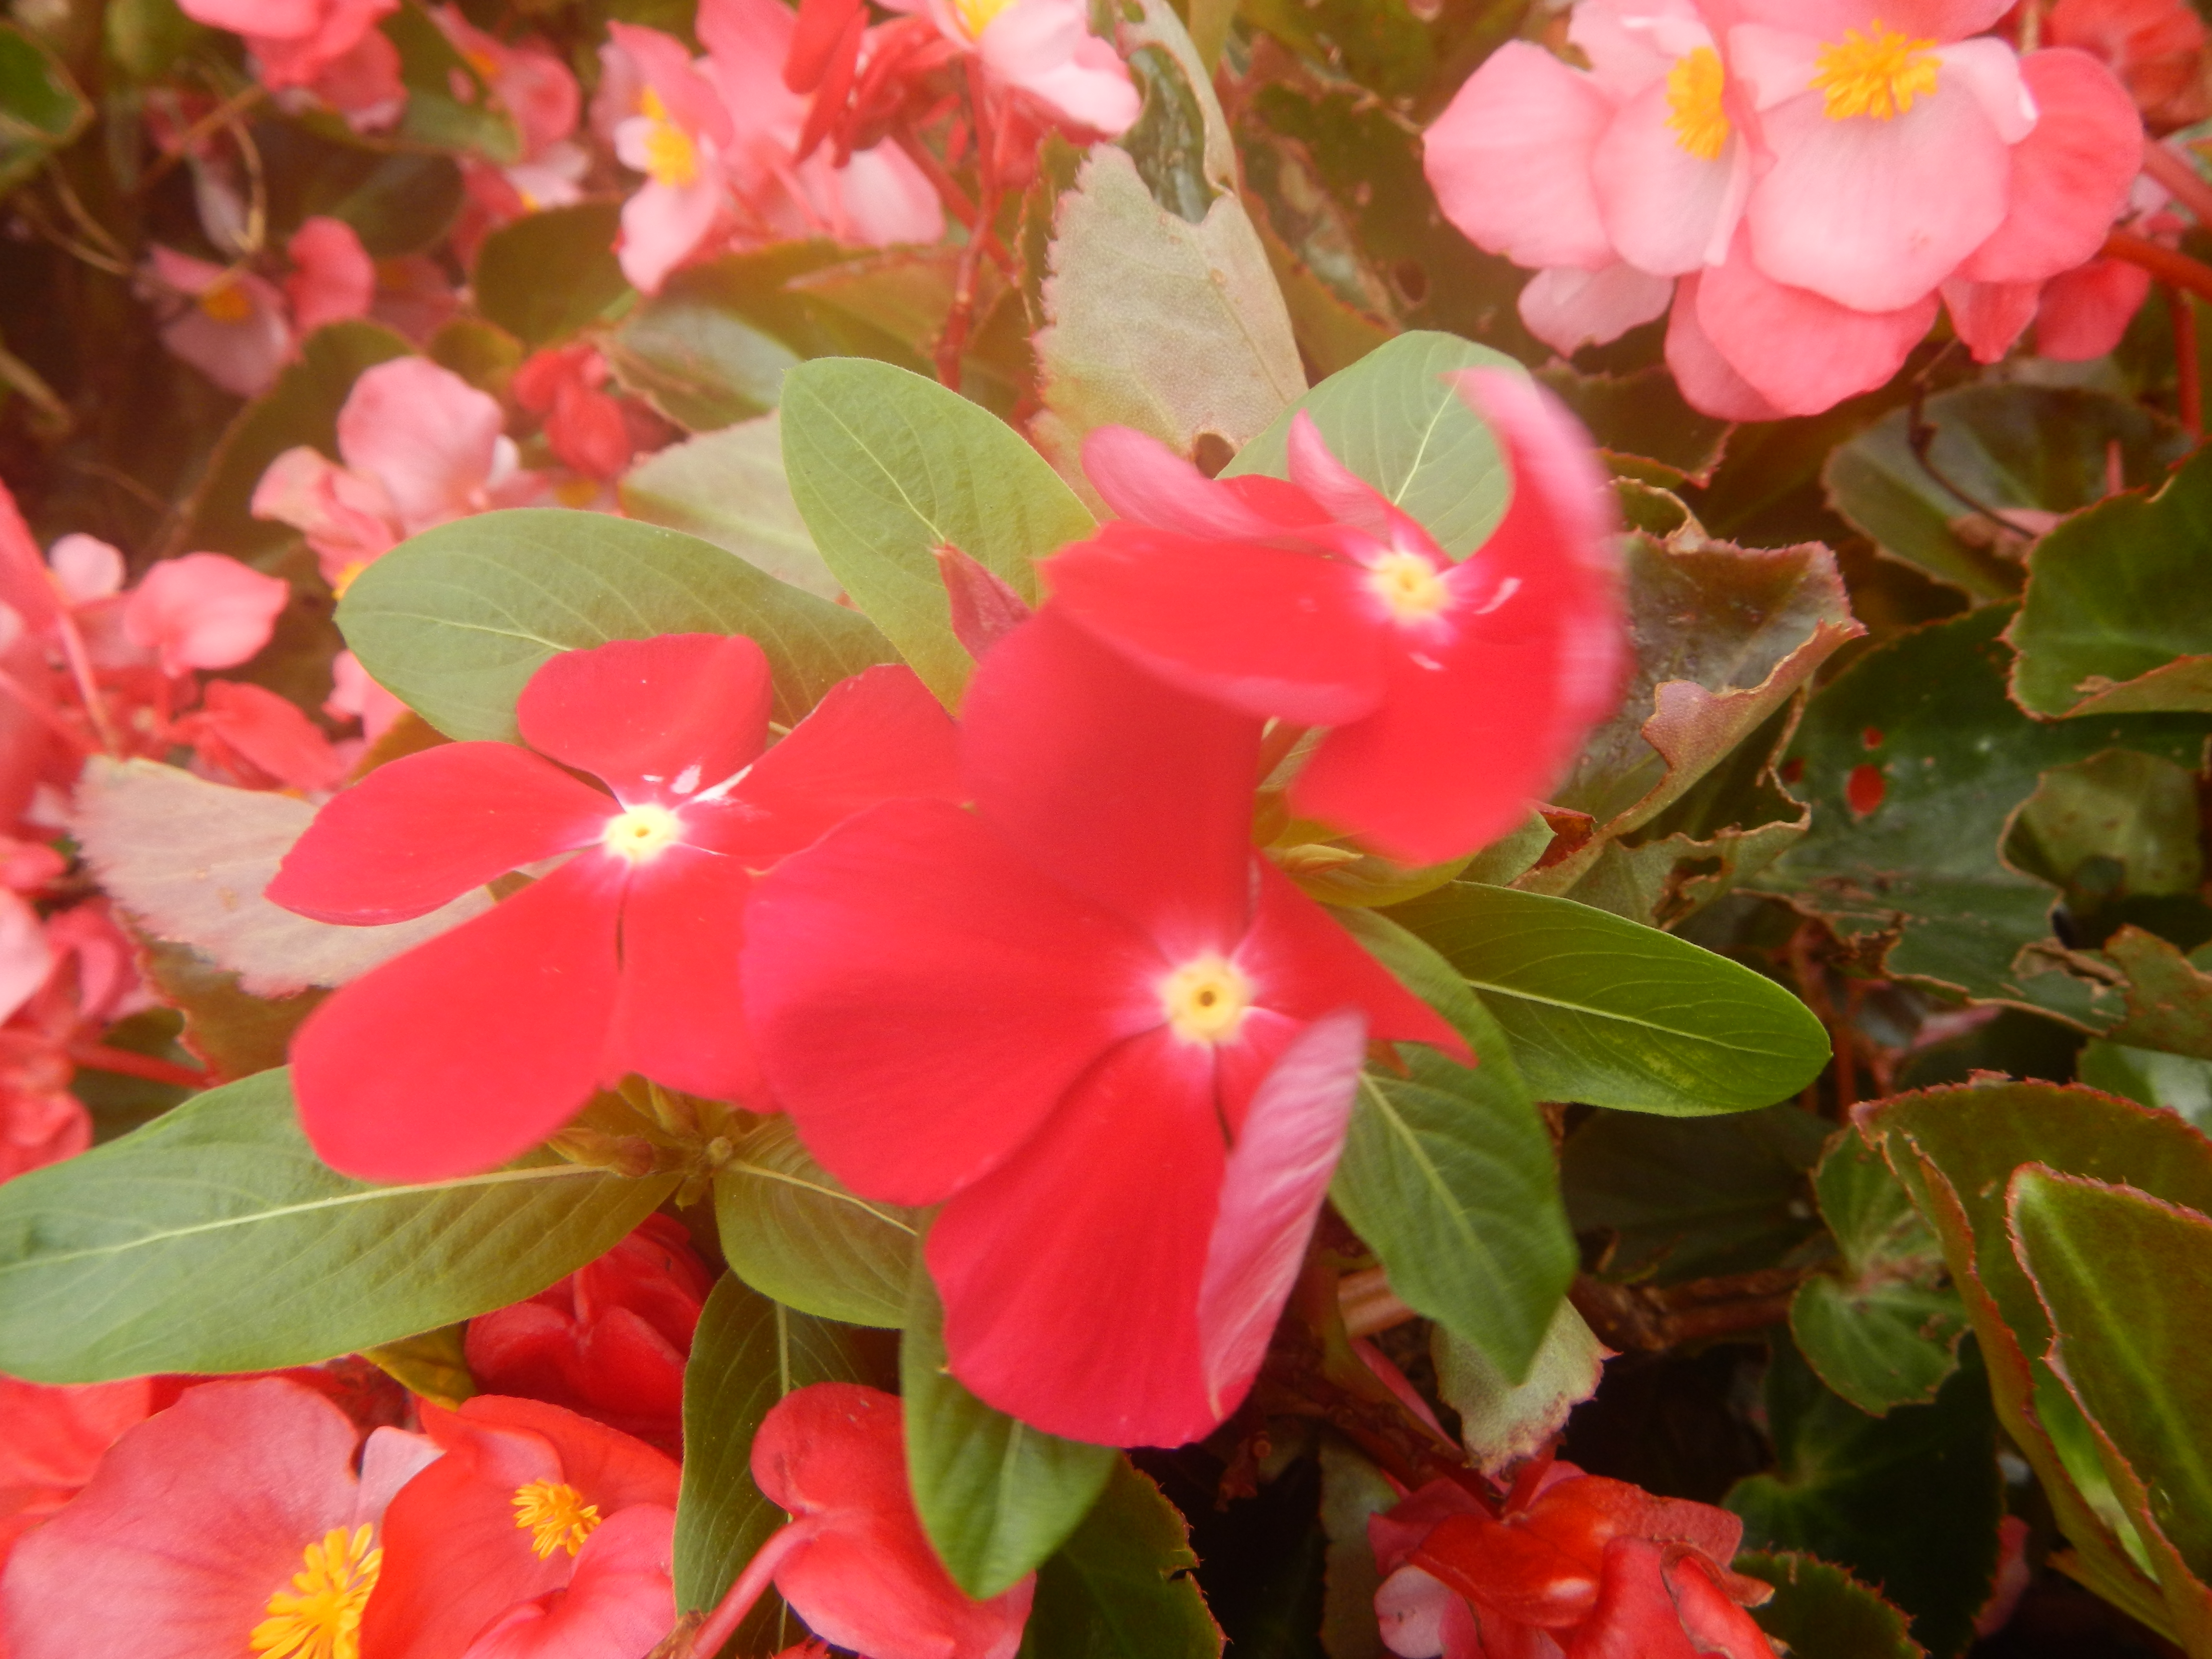 File02058jfclose Ups Of Vinca Flowers Pacifica Mixedfvf 07g